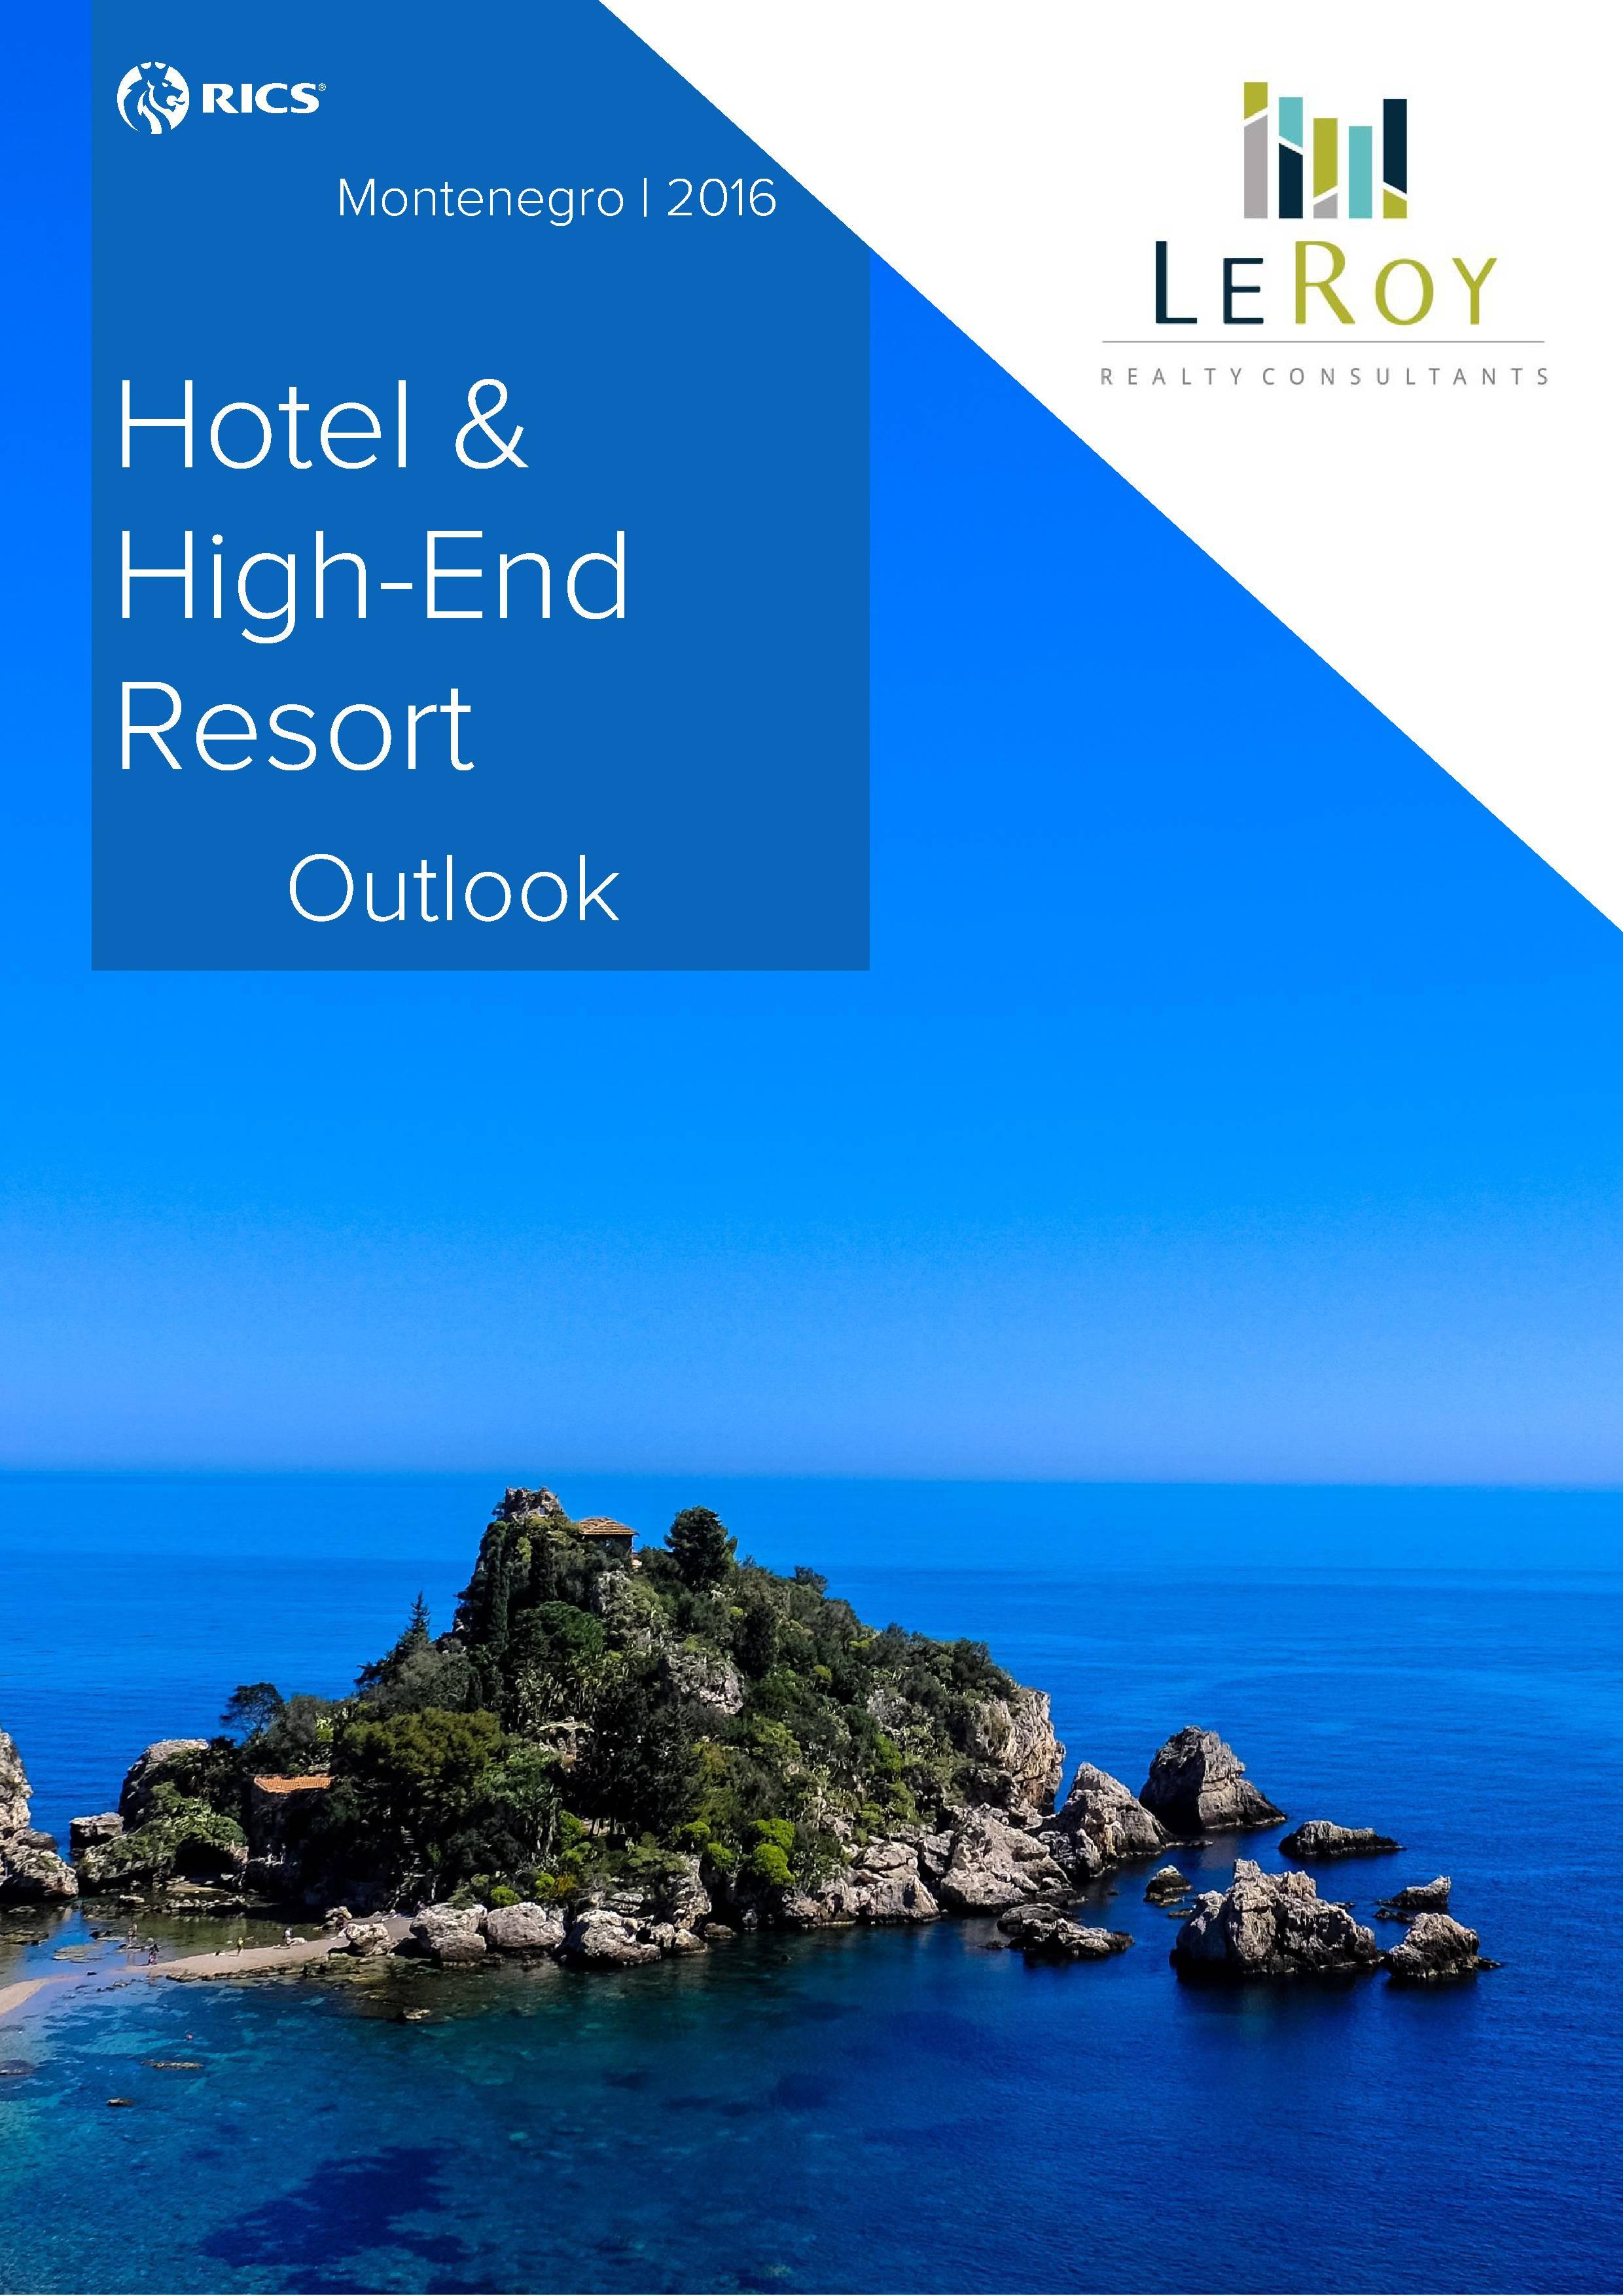 Montenegro Hotel & High-End Resort Outlook, 2016 - LeRoy